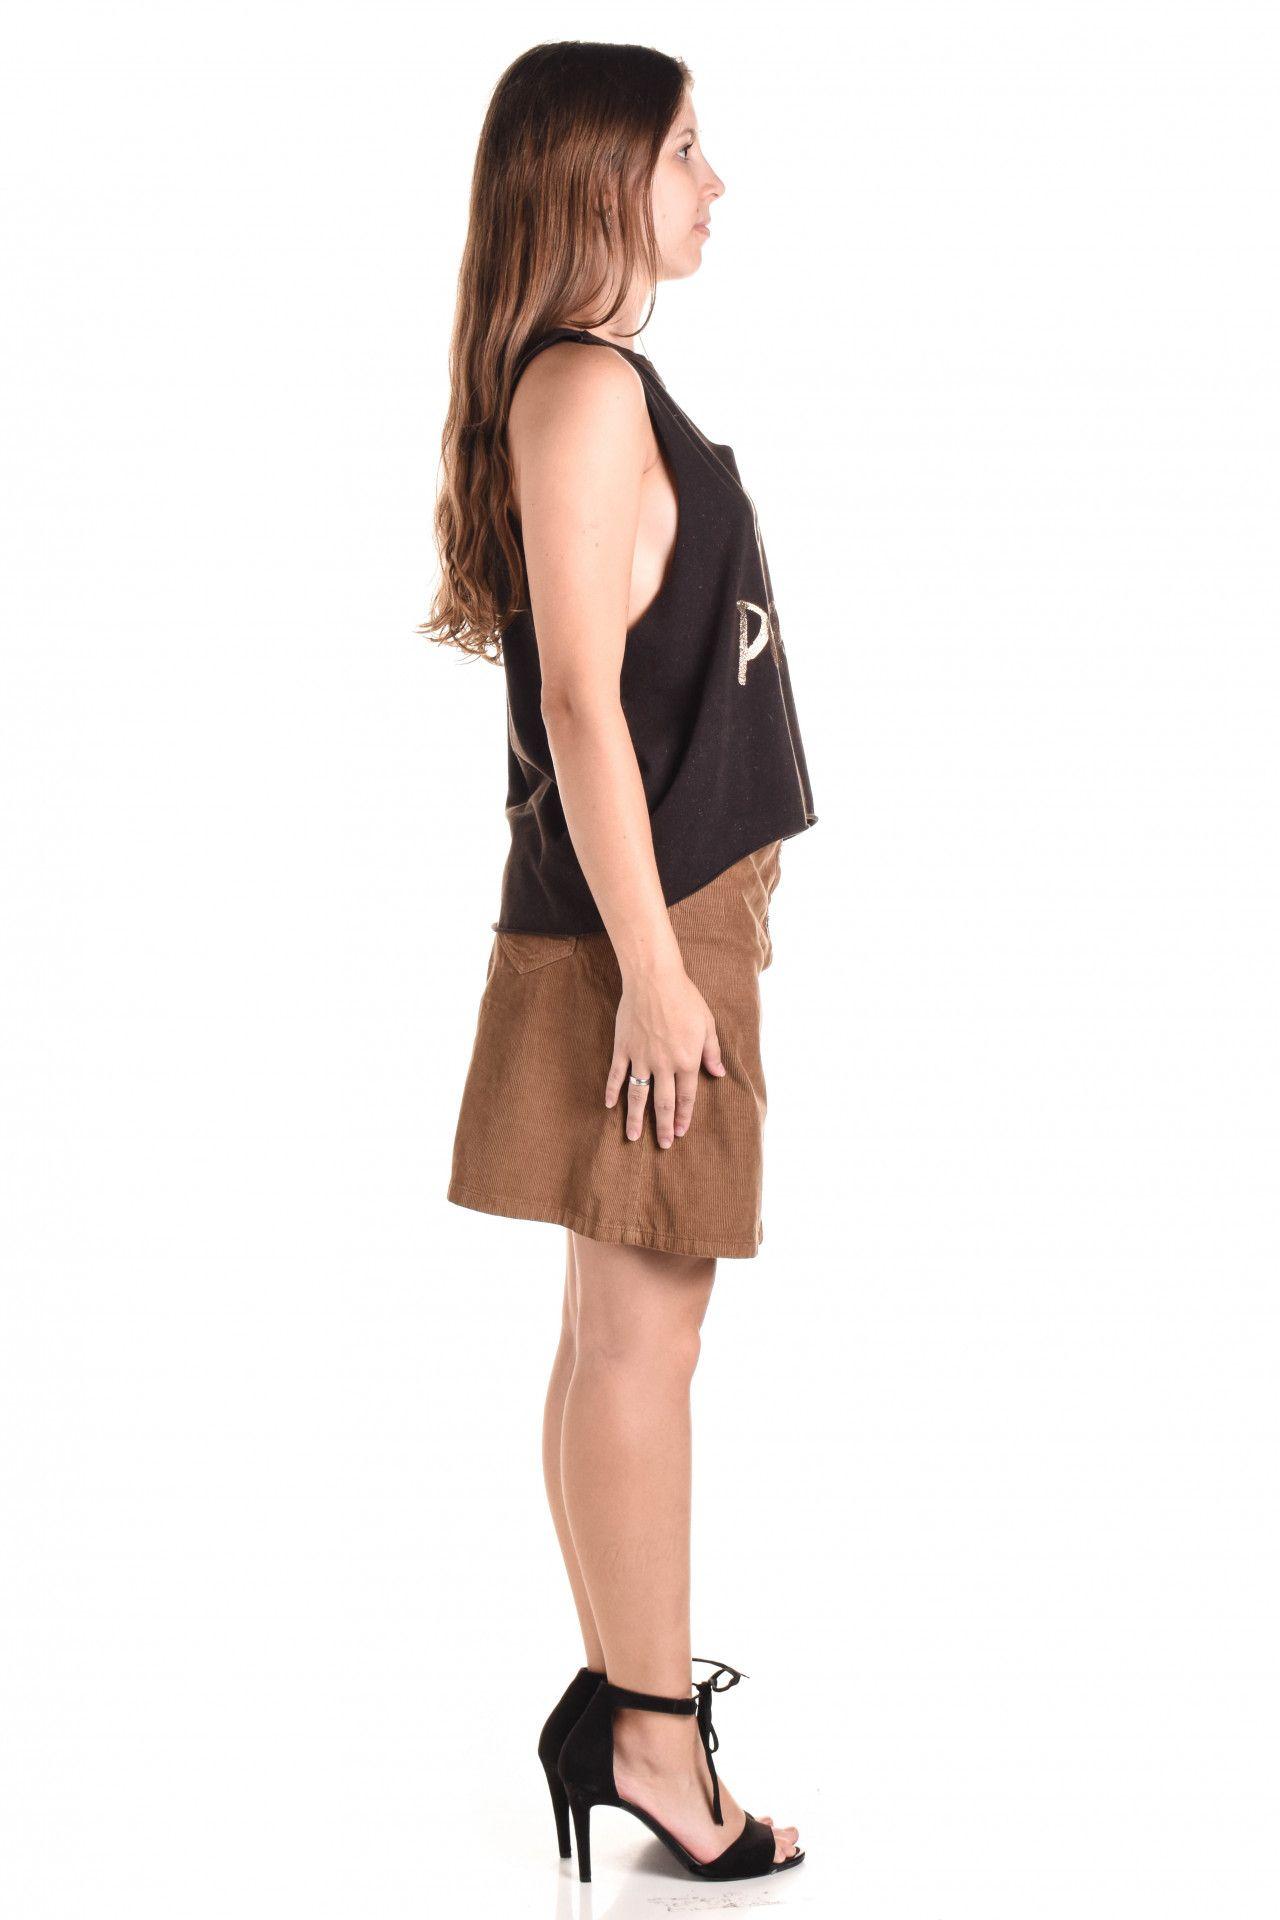 Damyller - Blusa Marrom Estampa  - Foto 4